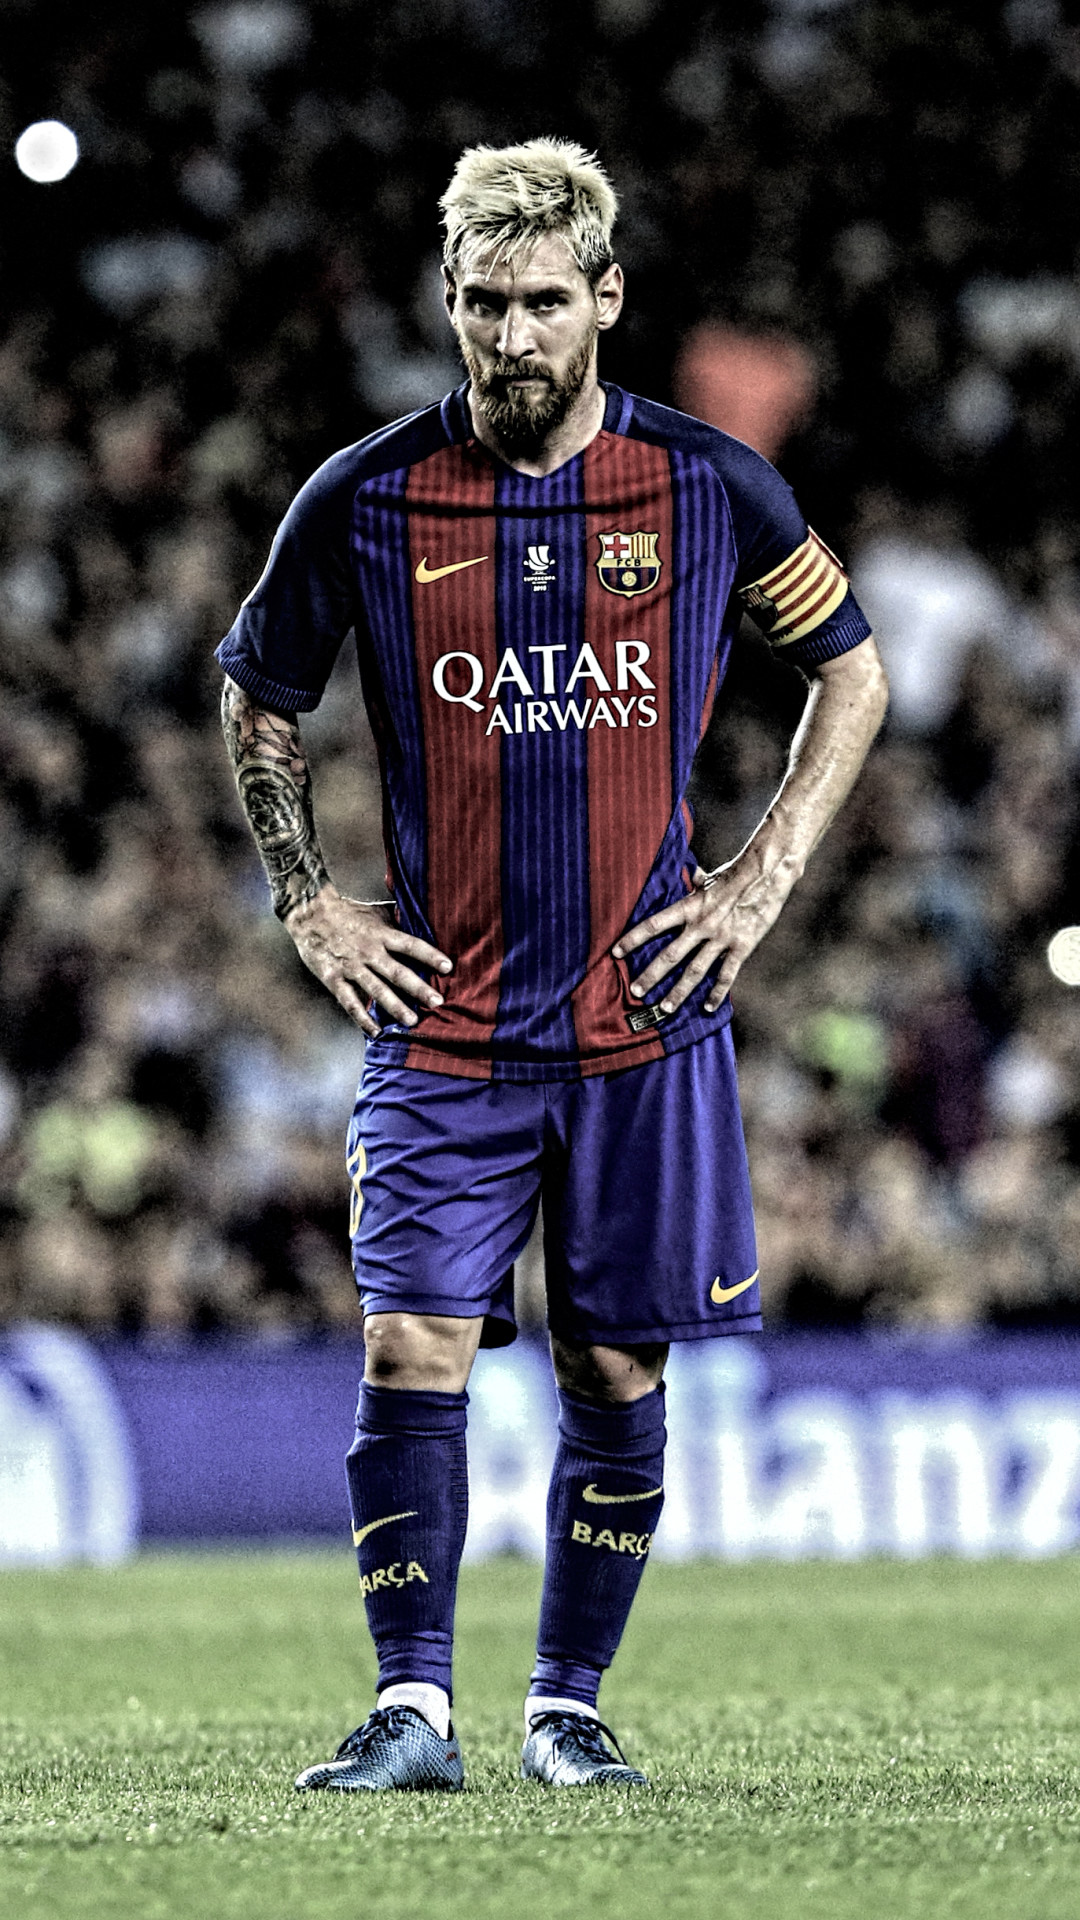 Messi Wallpaper 74 Images